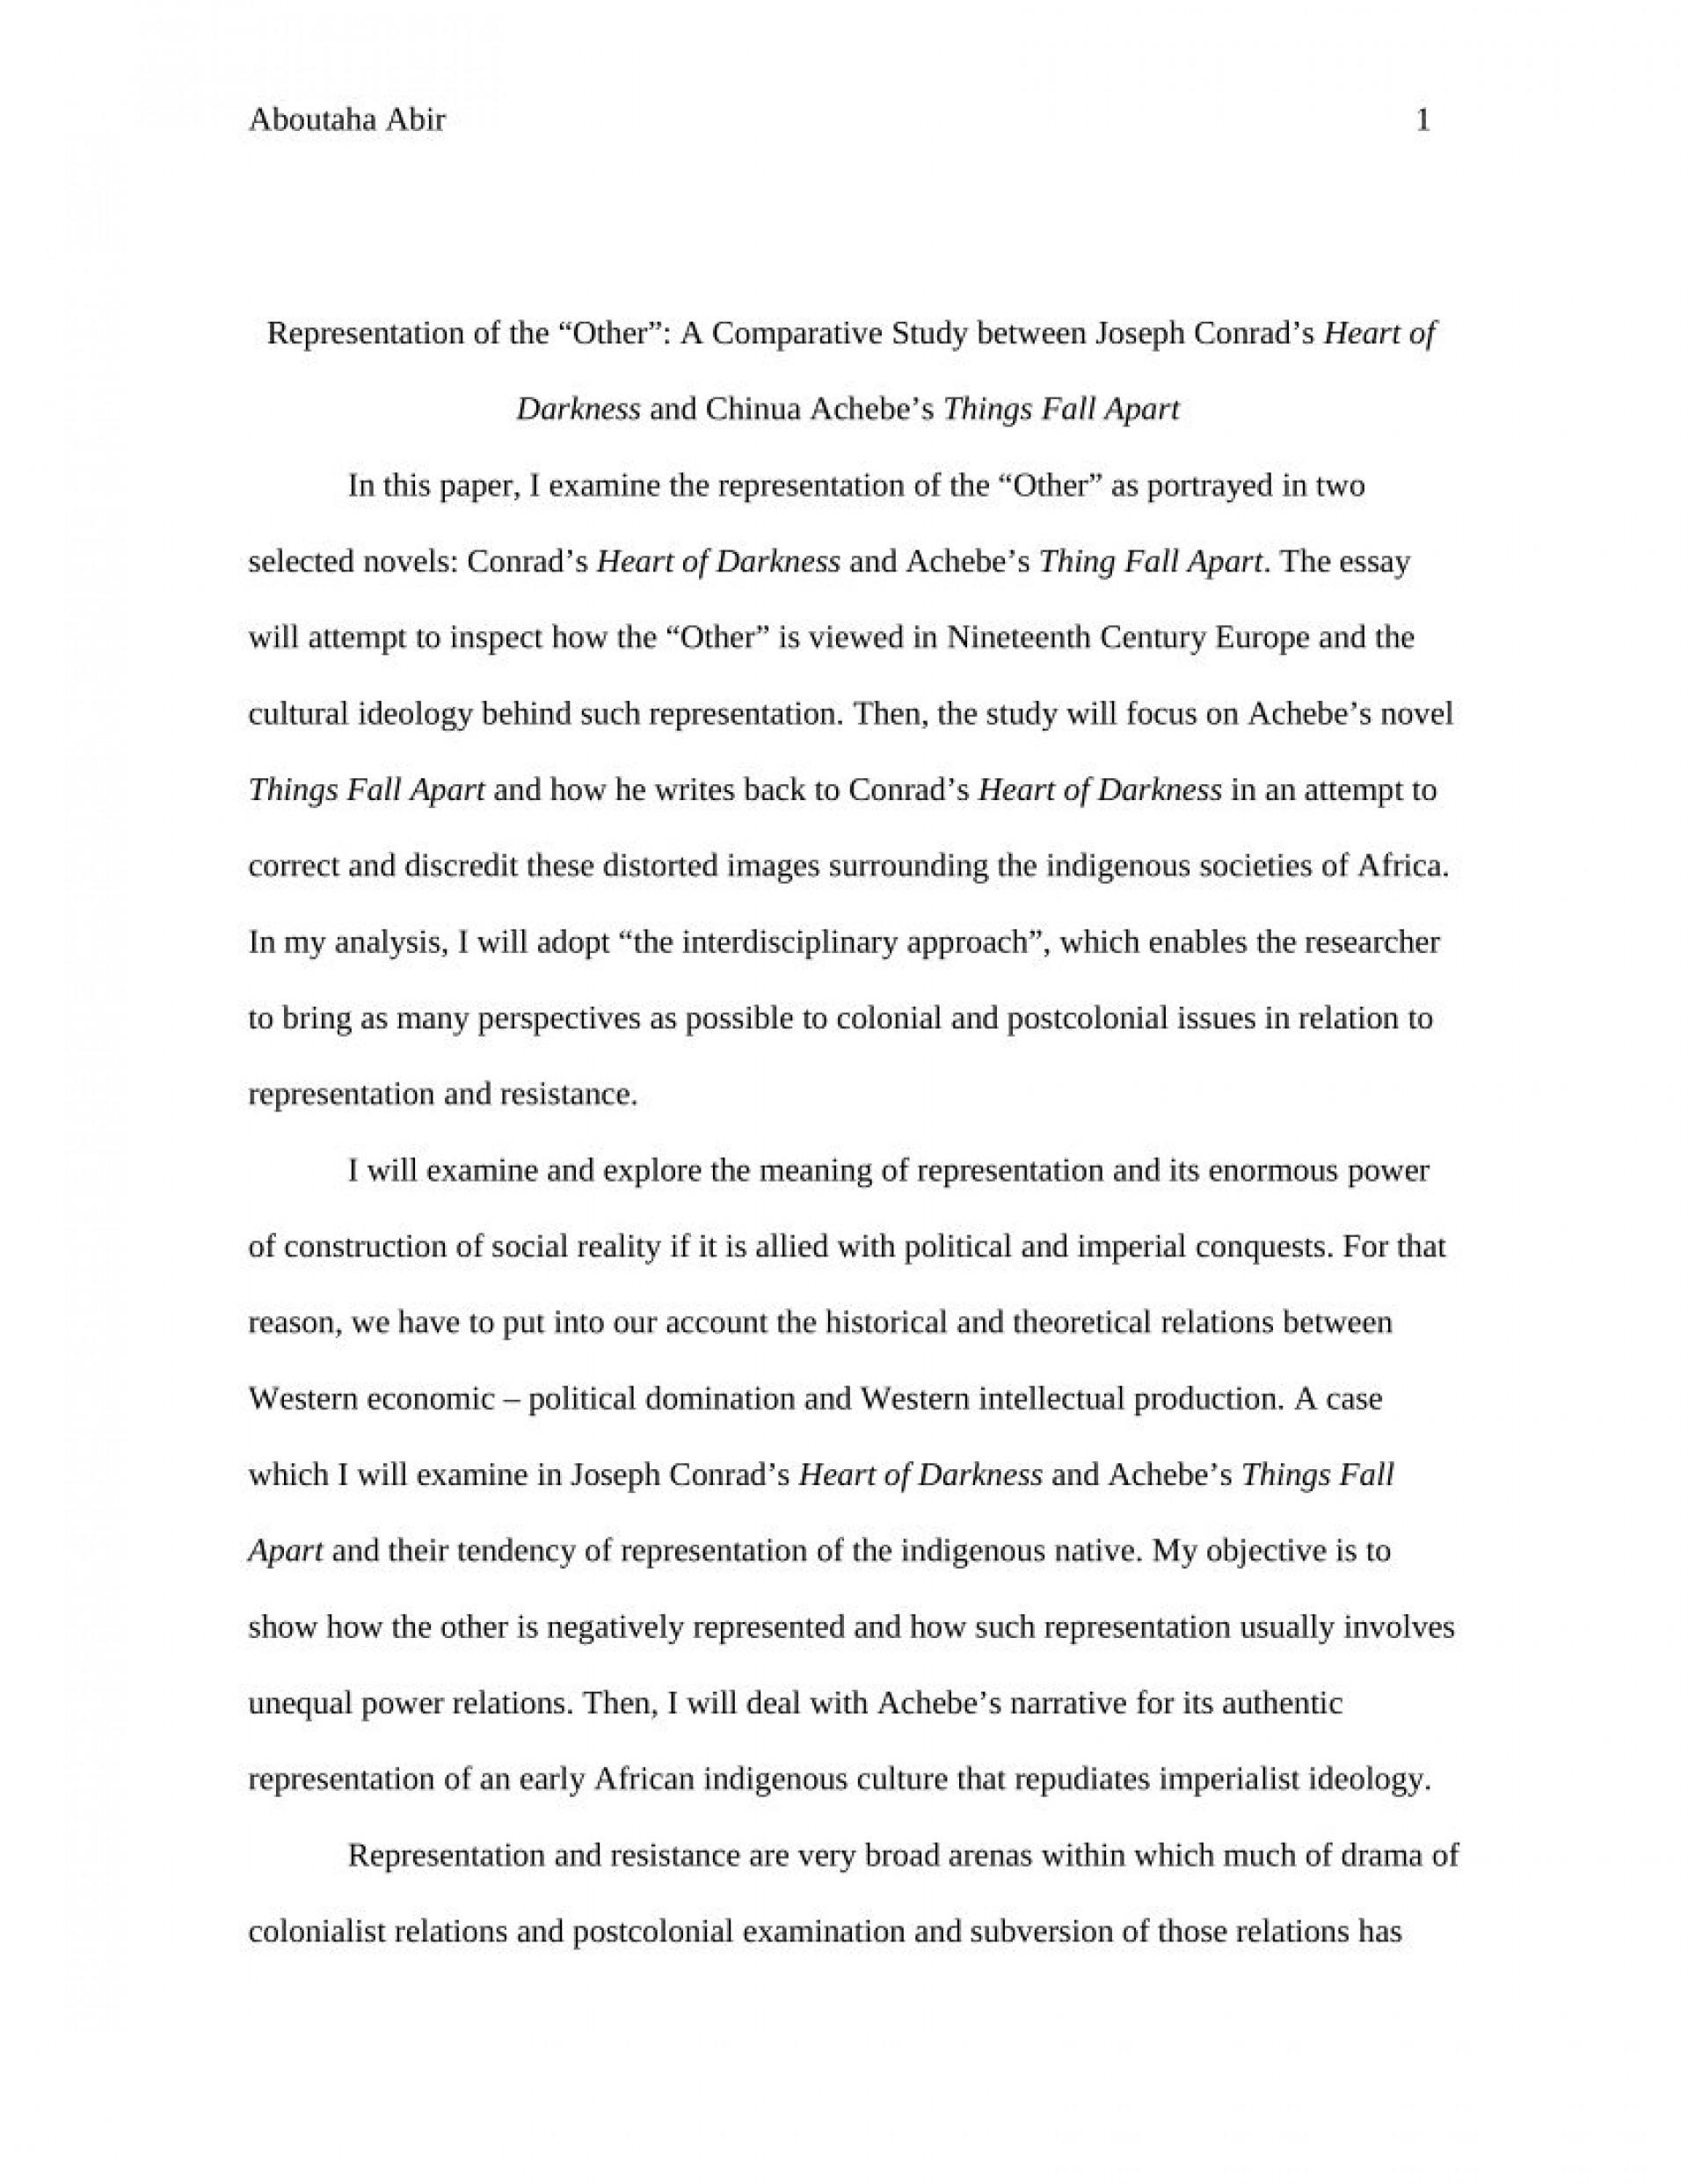 003 Formidable Thing Fall Apart Essay Design 1920